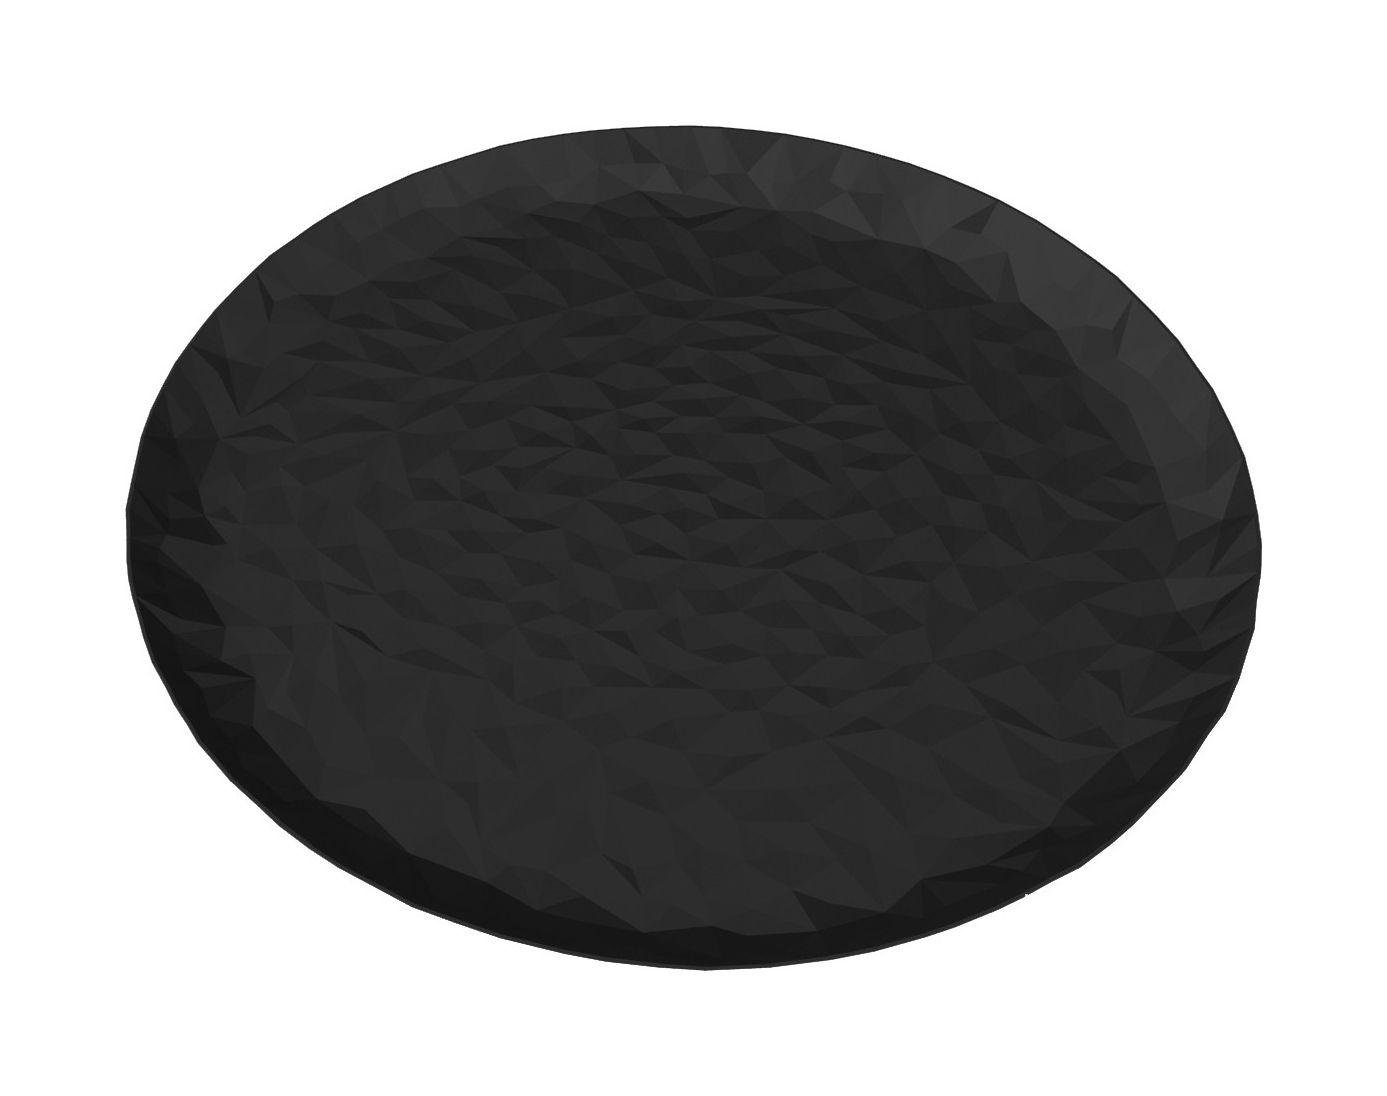 Tischkultur - Tabletts - Joy N.3 Tablett / Ø 40 cm - Alessi - Schwarz - Acier inoxydable avec coloration résine époxy